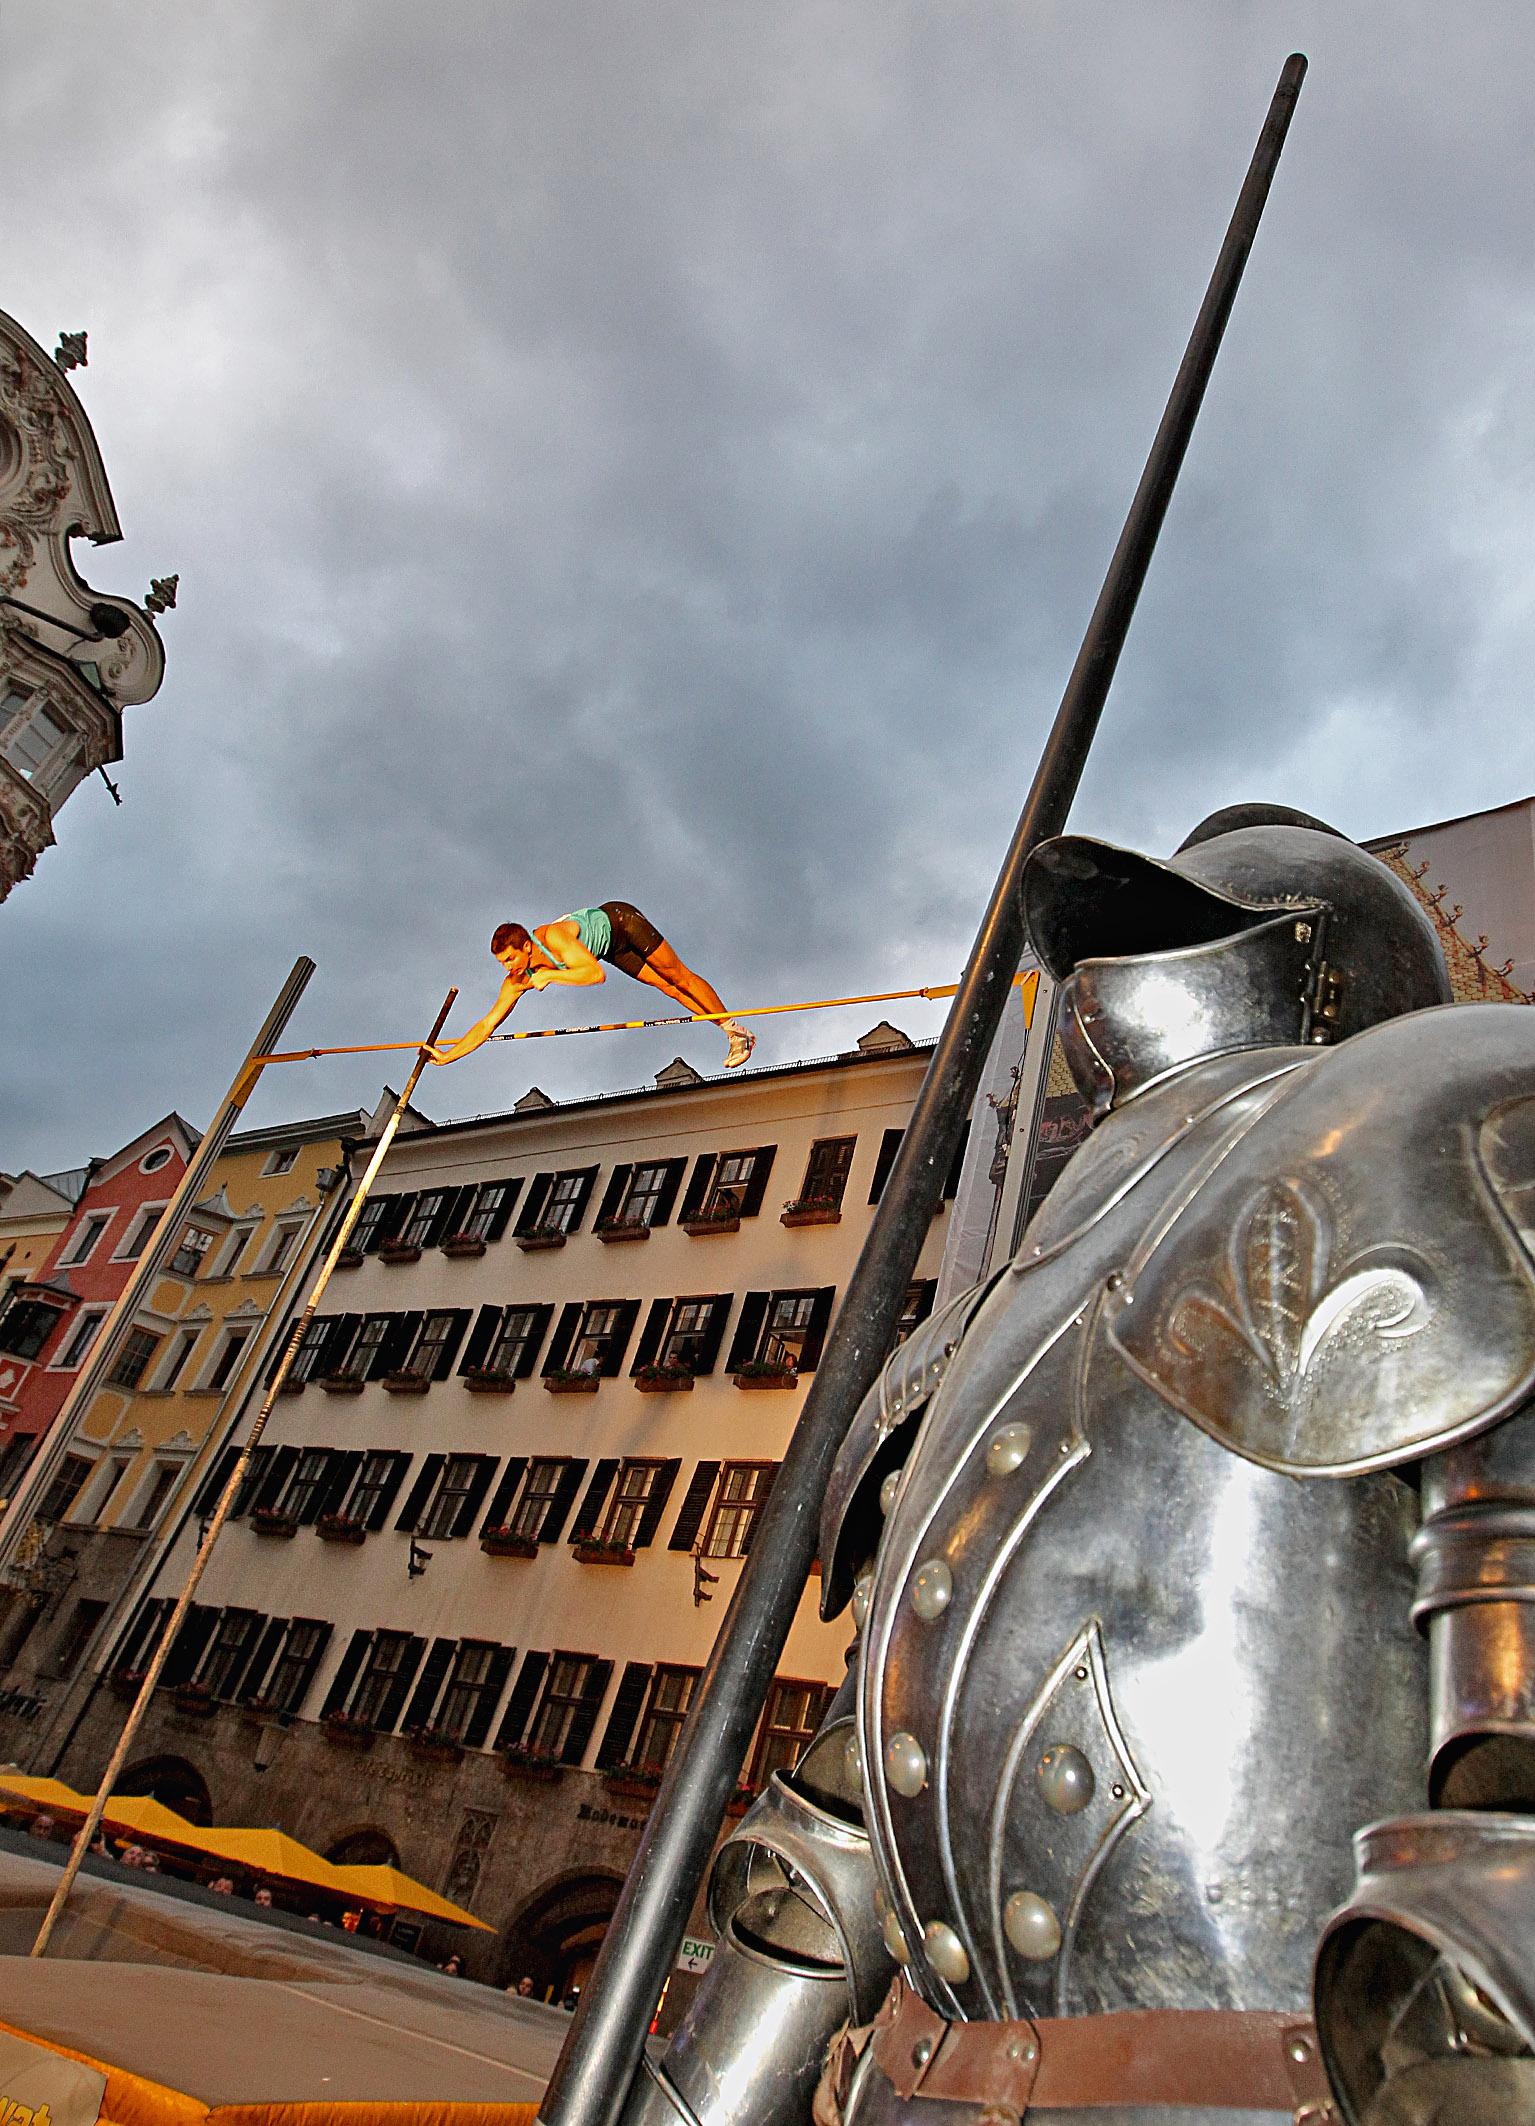 ©_PHOTO_PLOHE Innsbruck AUT.jpg